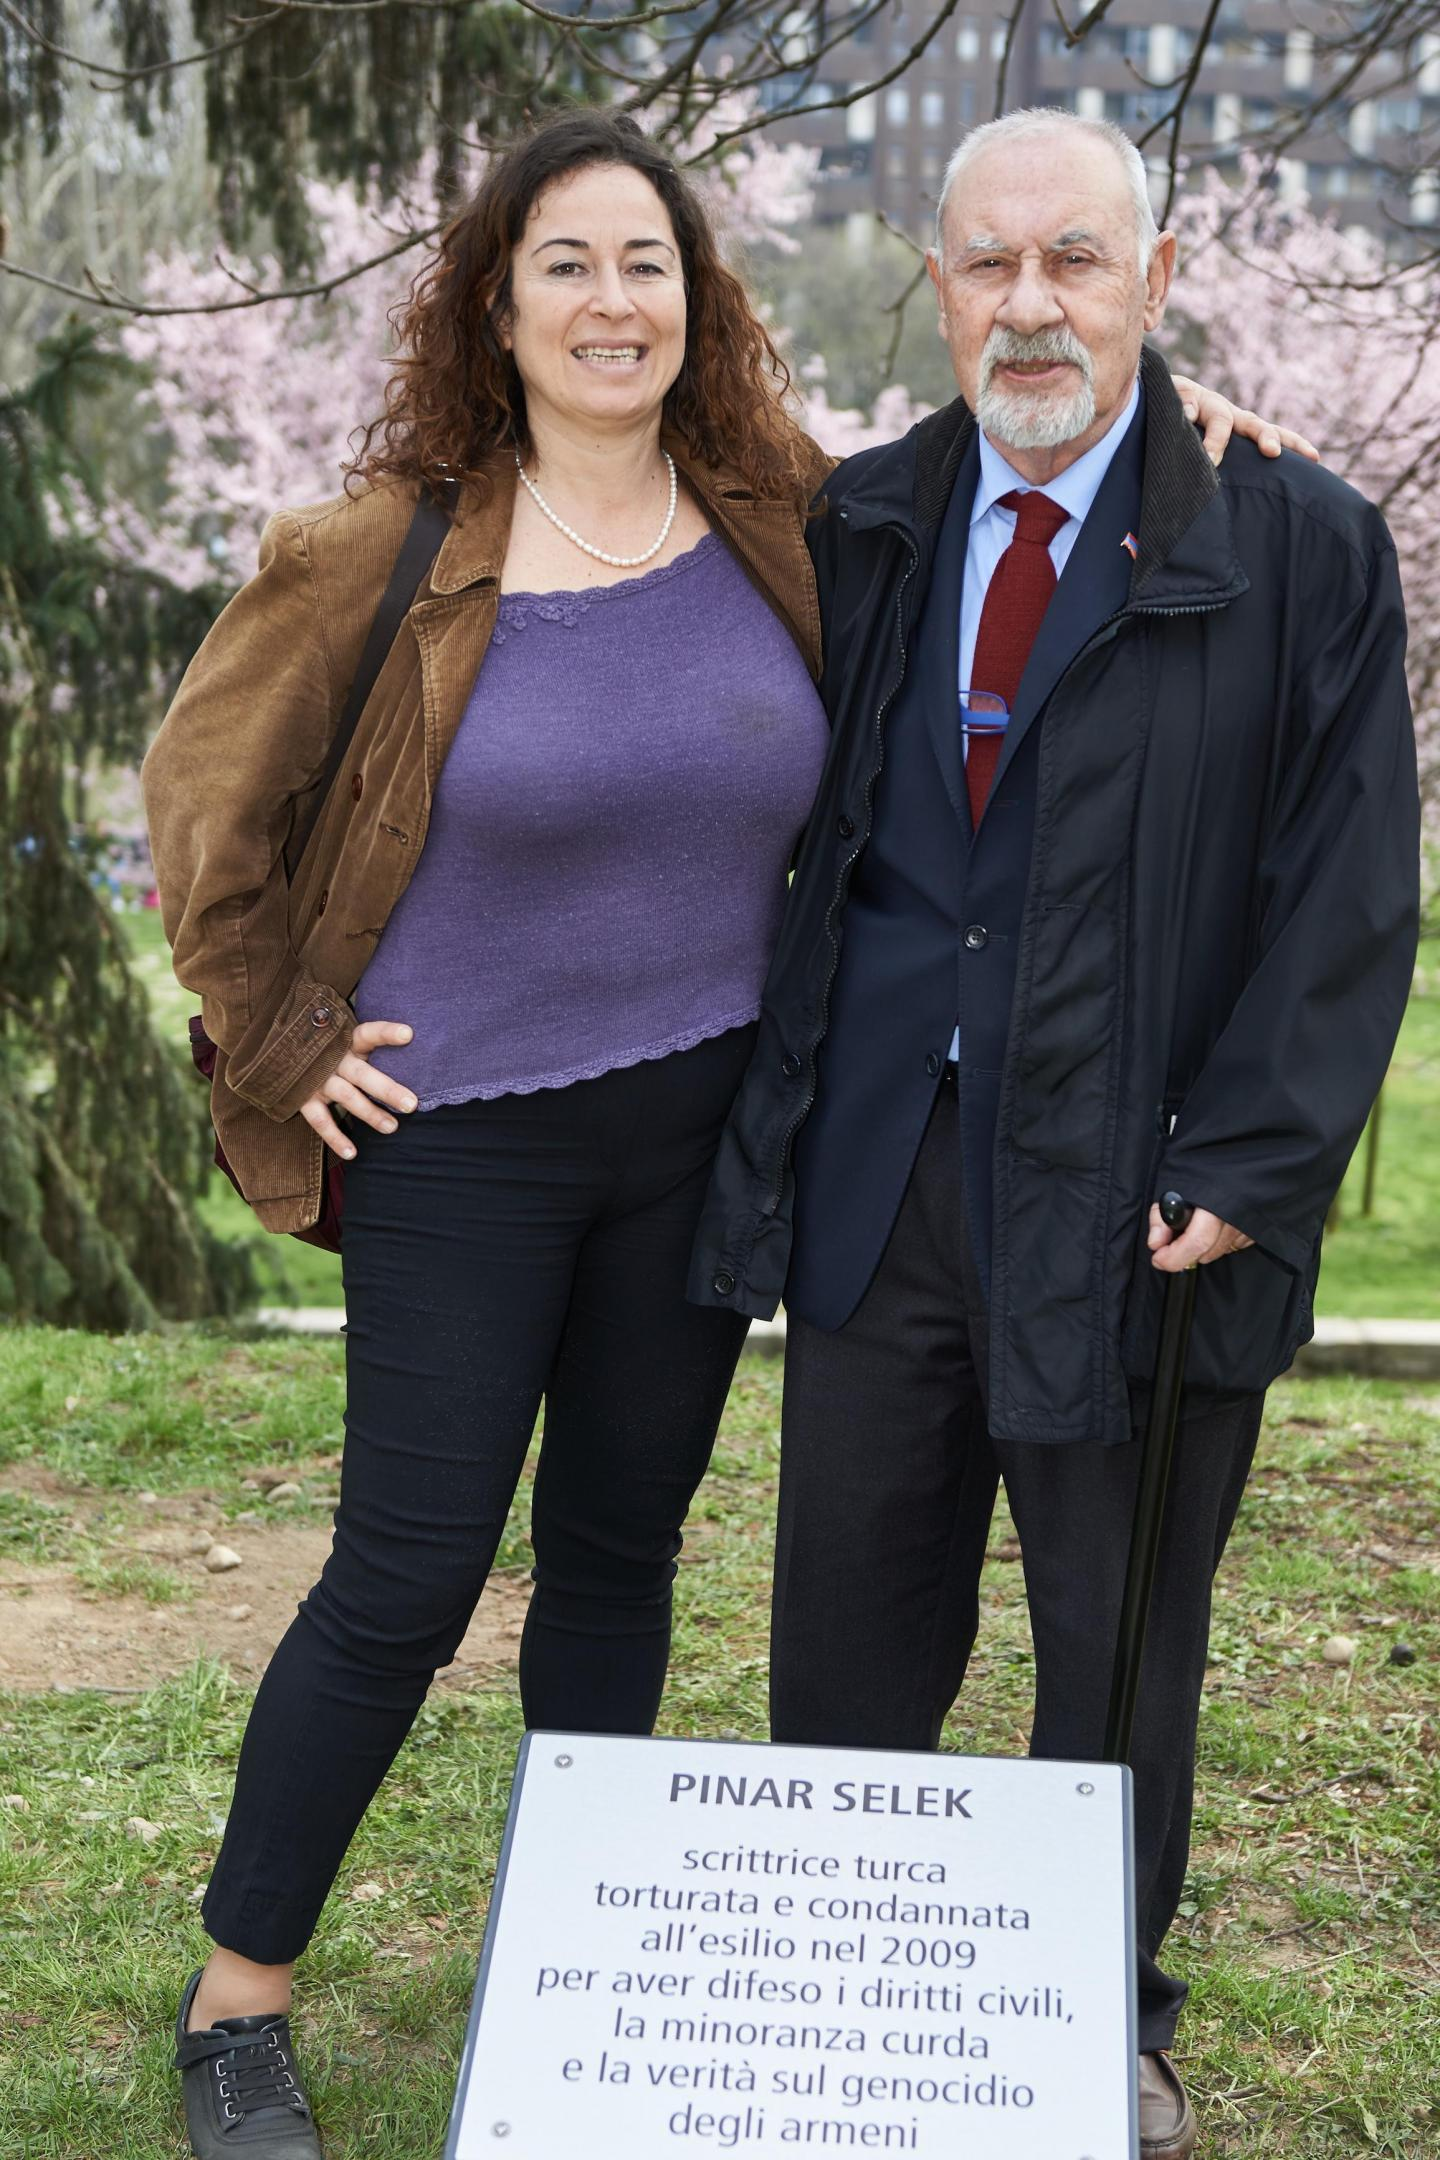 Pinar Selek and Pietro Kuciukian